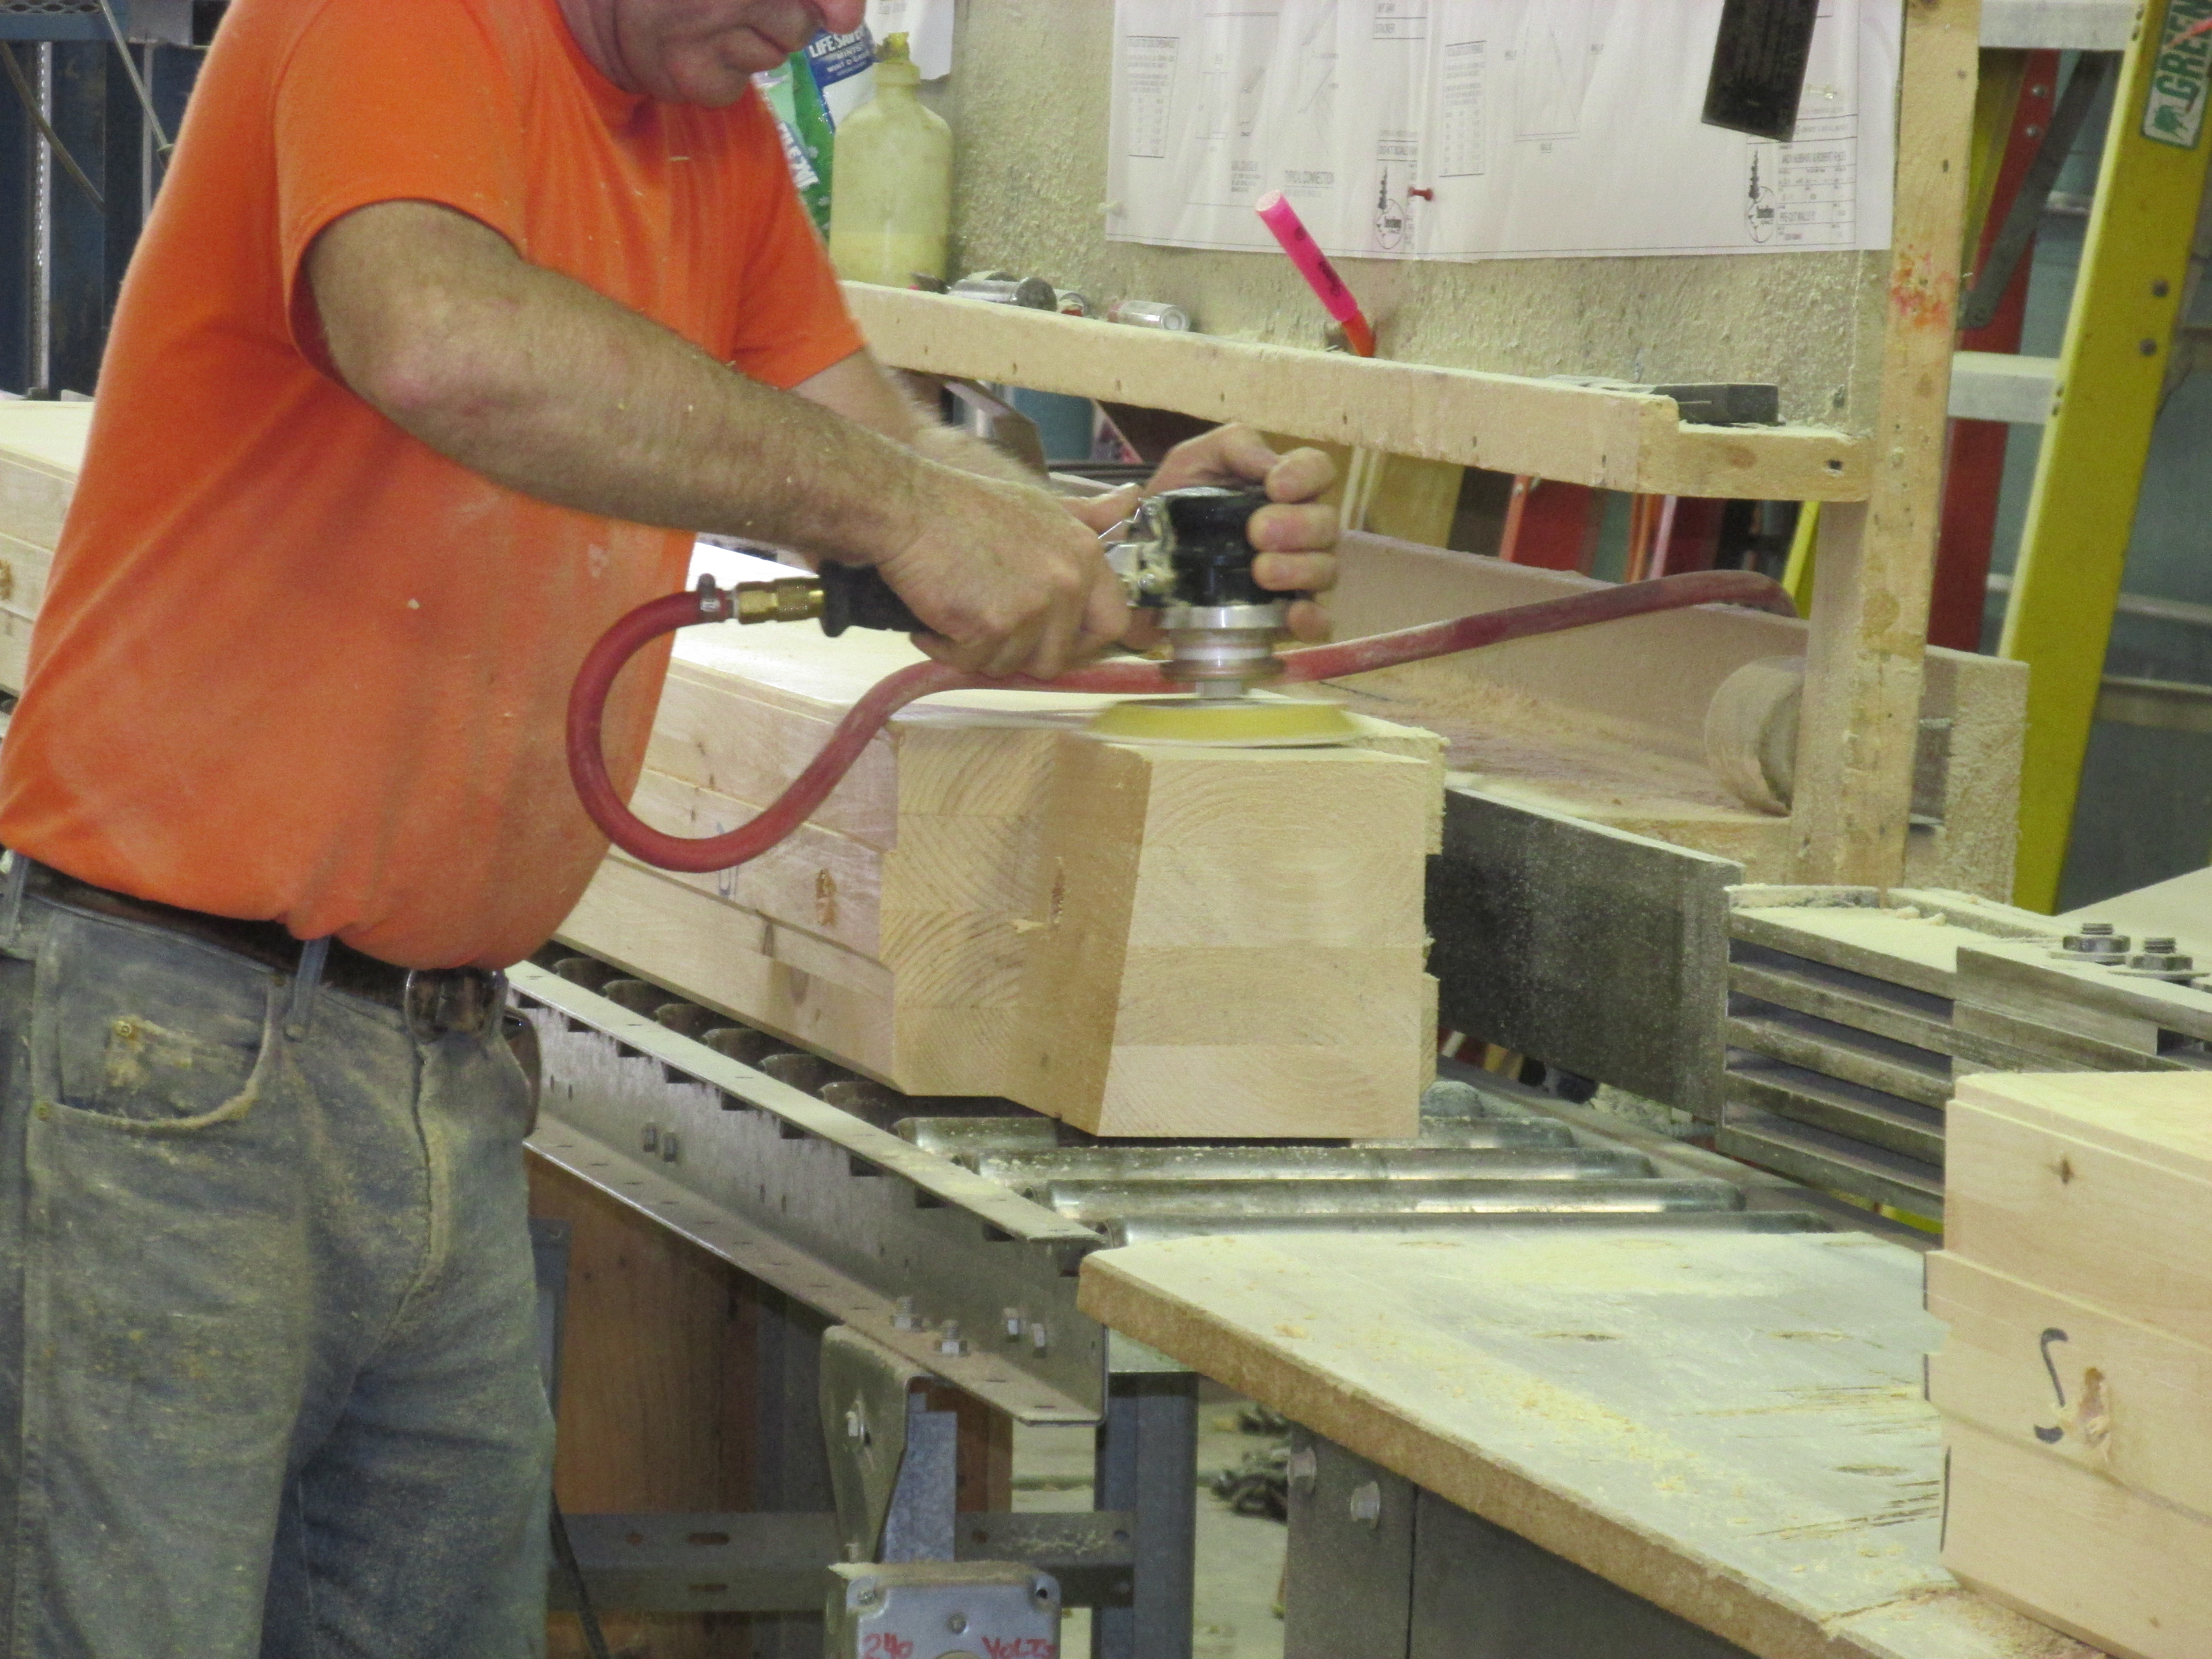 Custom Built Log Home - Part 2 - Manufacturing